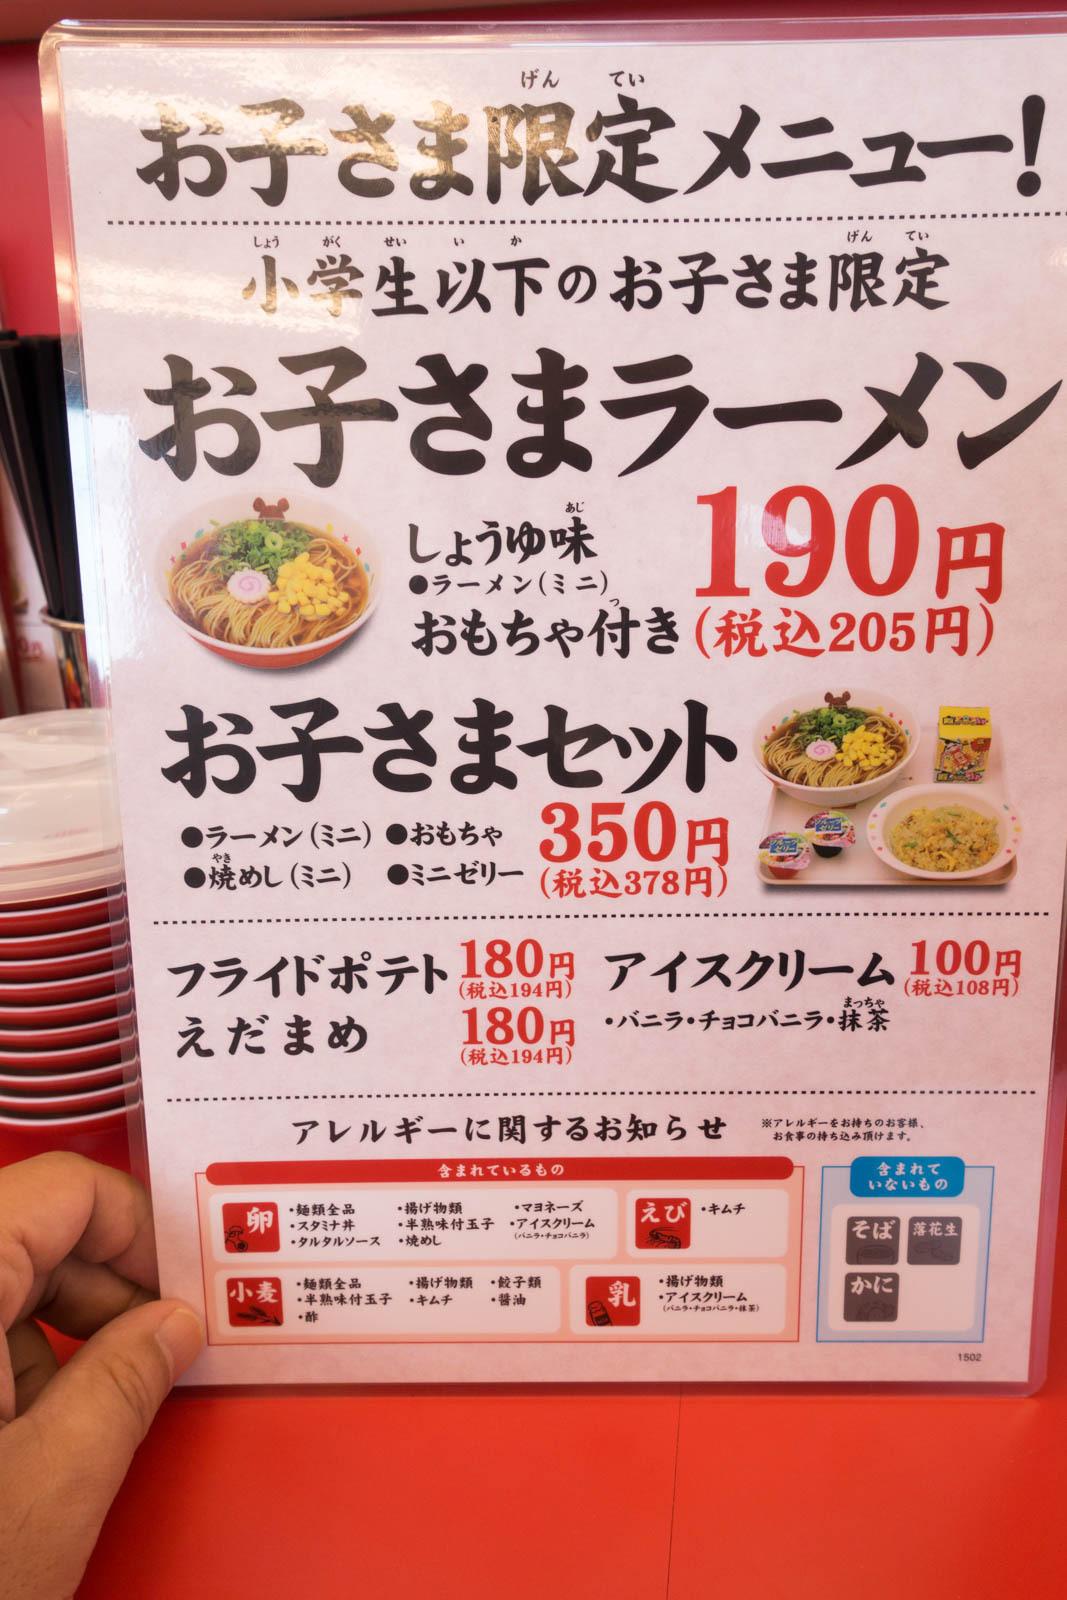 ラーメン 魁力屋 鎌倉手広店